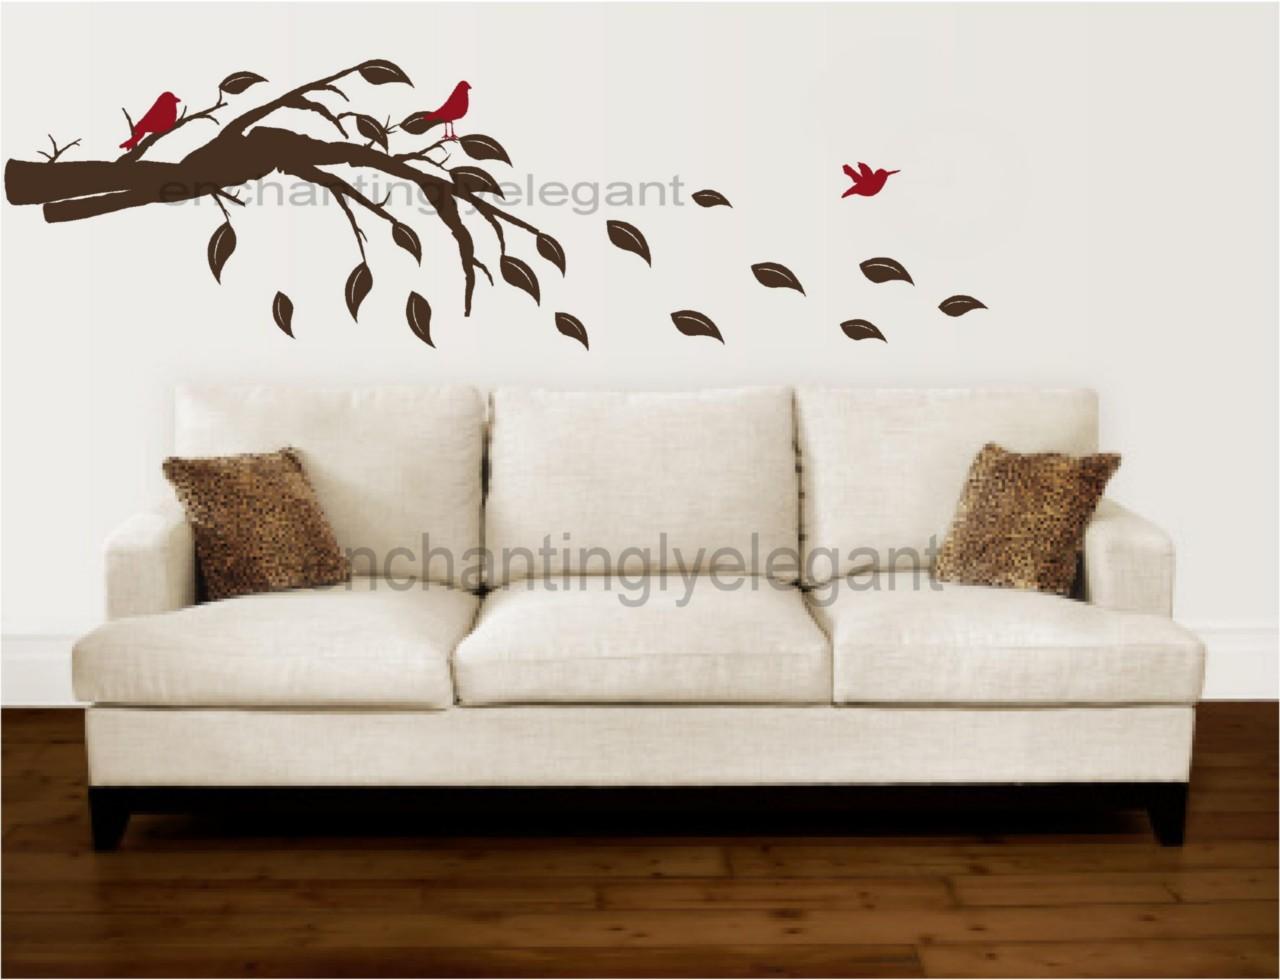 Home amp garden gt home decor gt decals stickers amp vinyl art